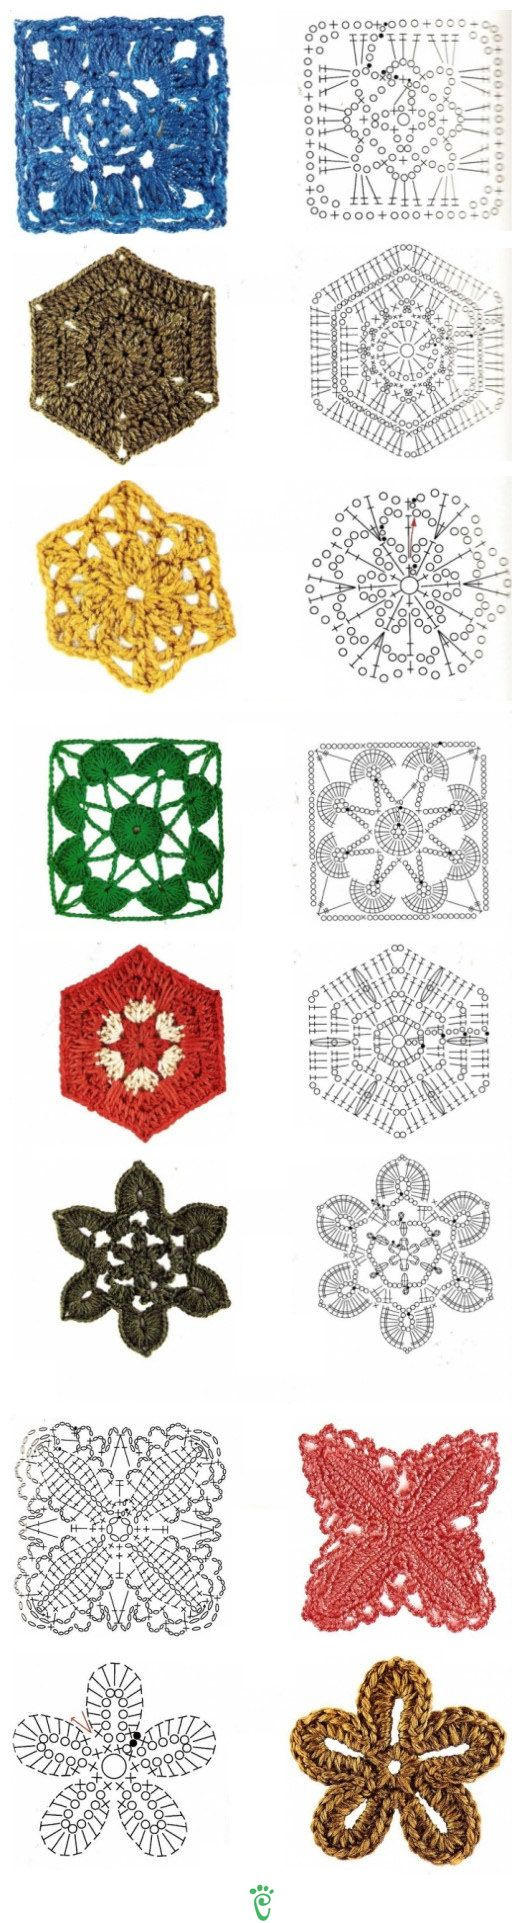 crochet motifs @Af 11/1/13